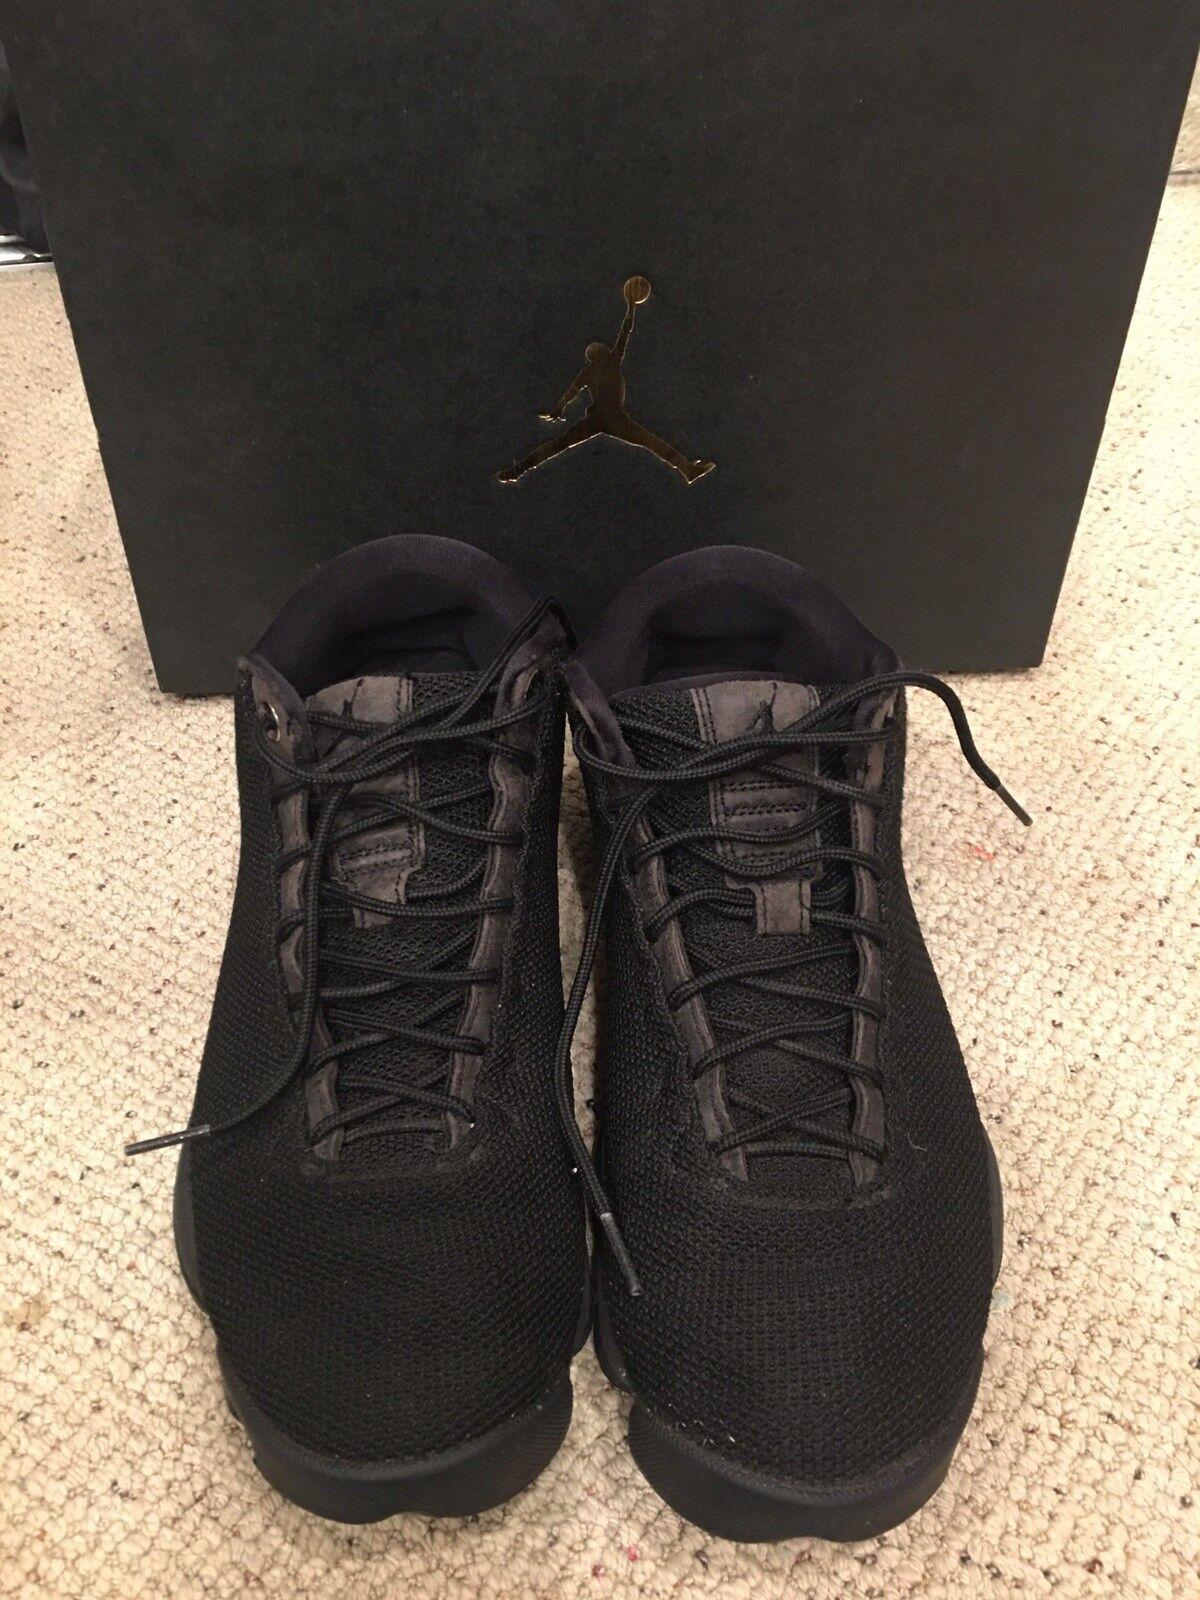 NIKE AIR JORDAN Horizon Low Triple Black Men's shoes Limited 845098-010 SIZE 8.5